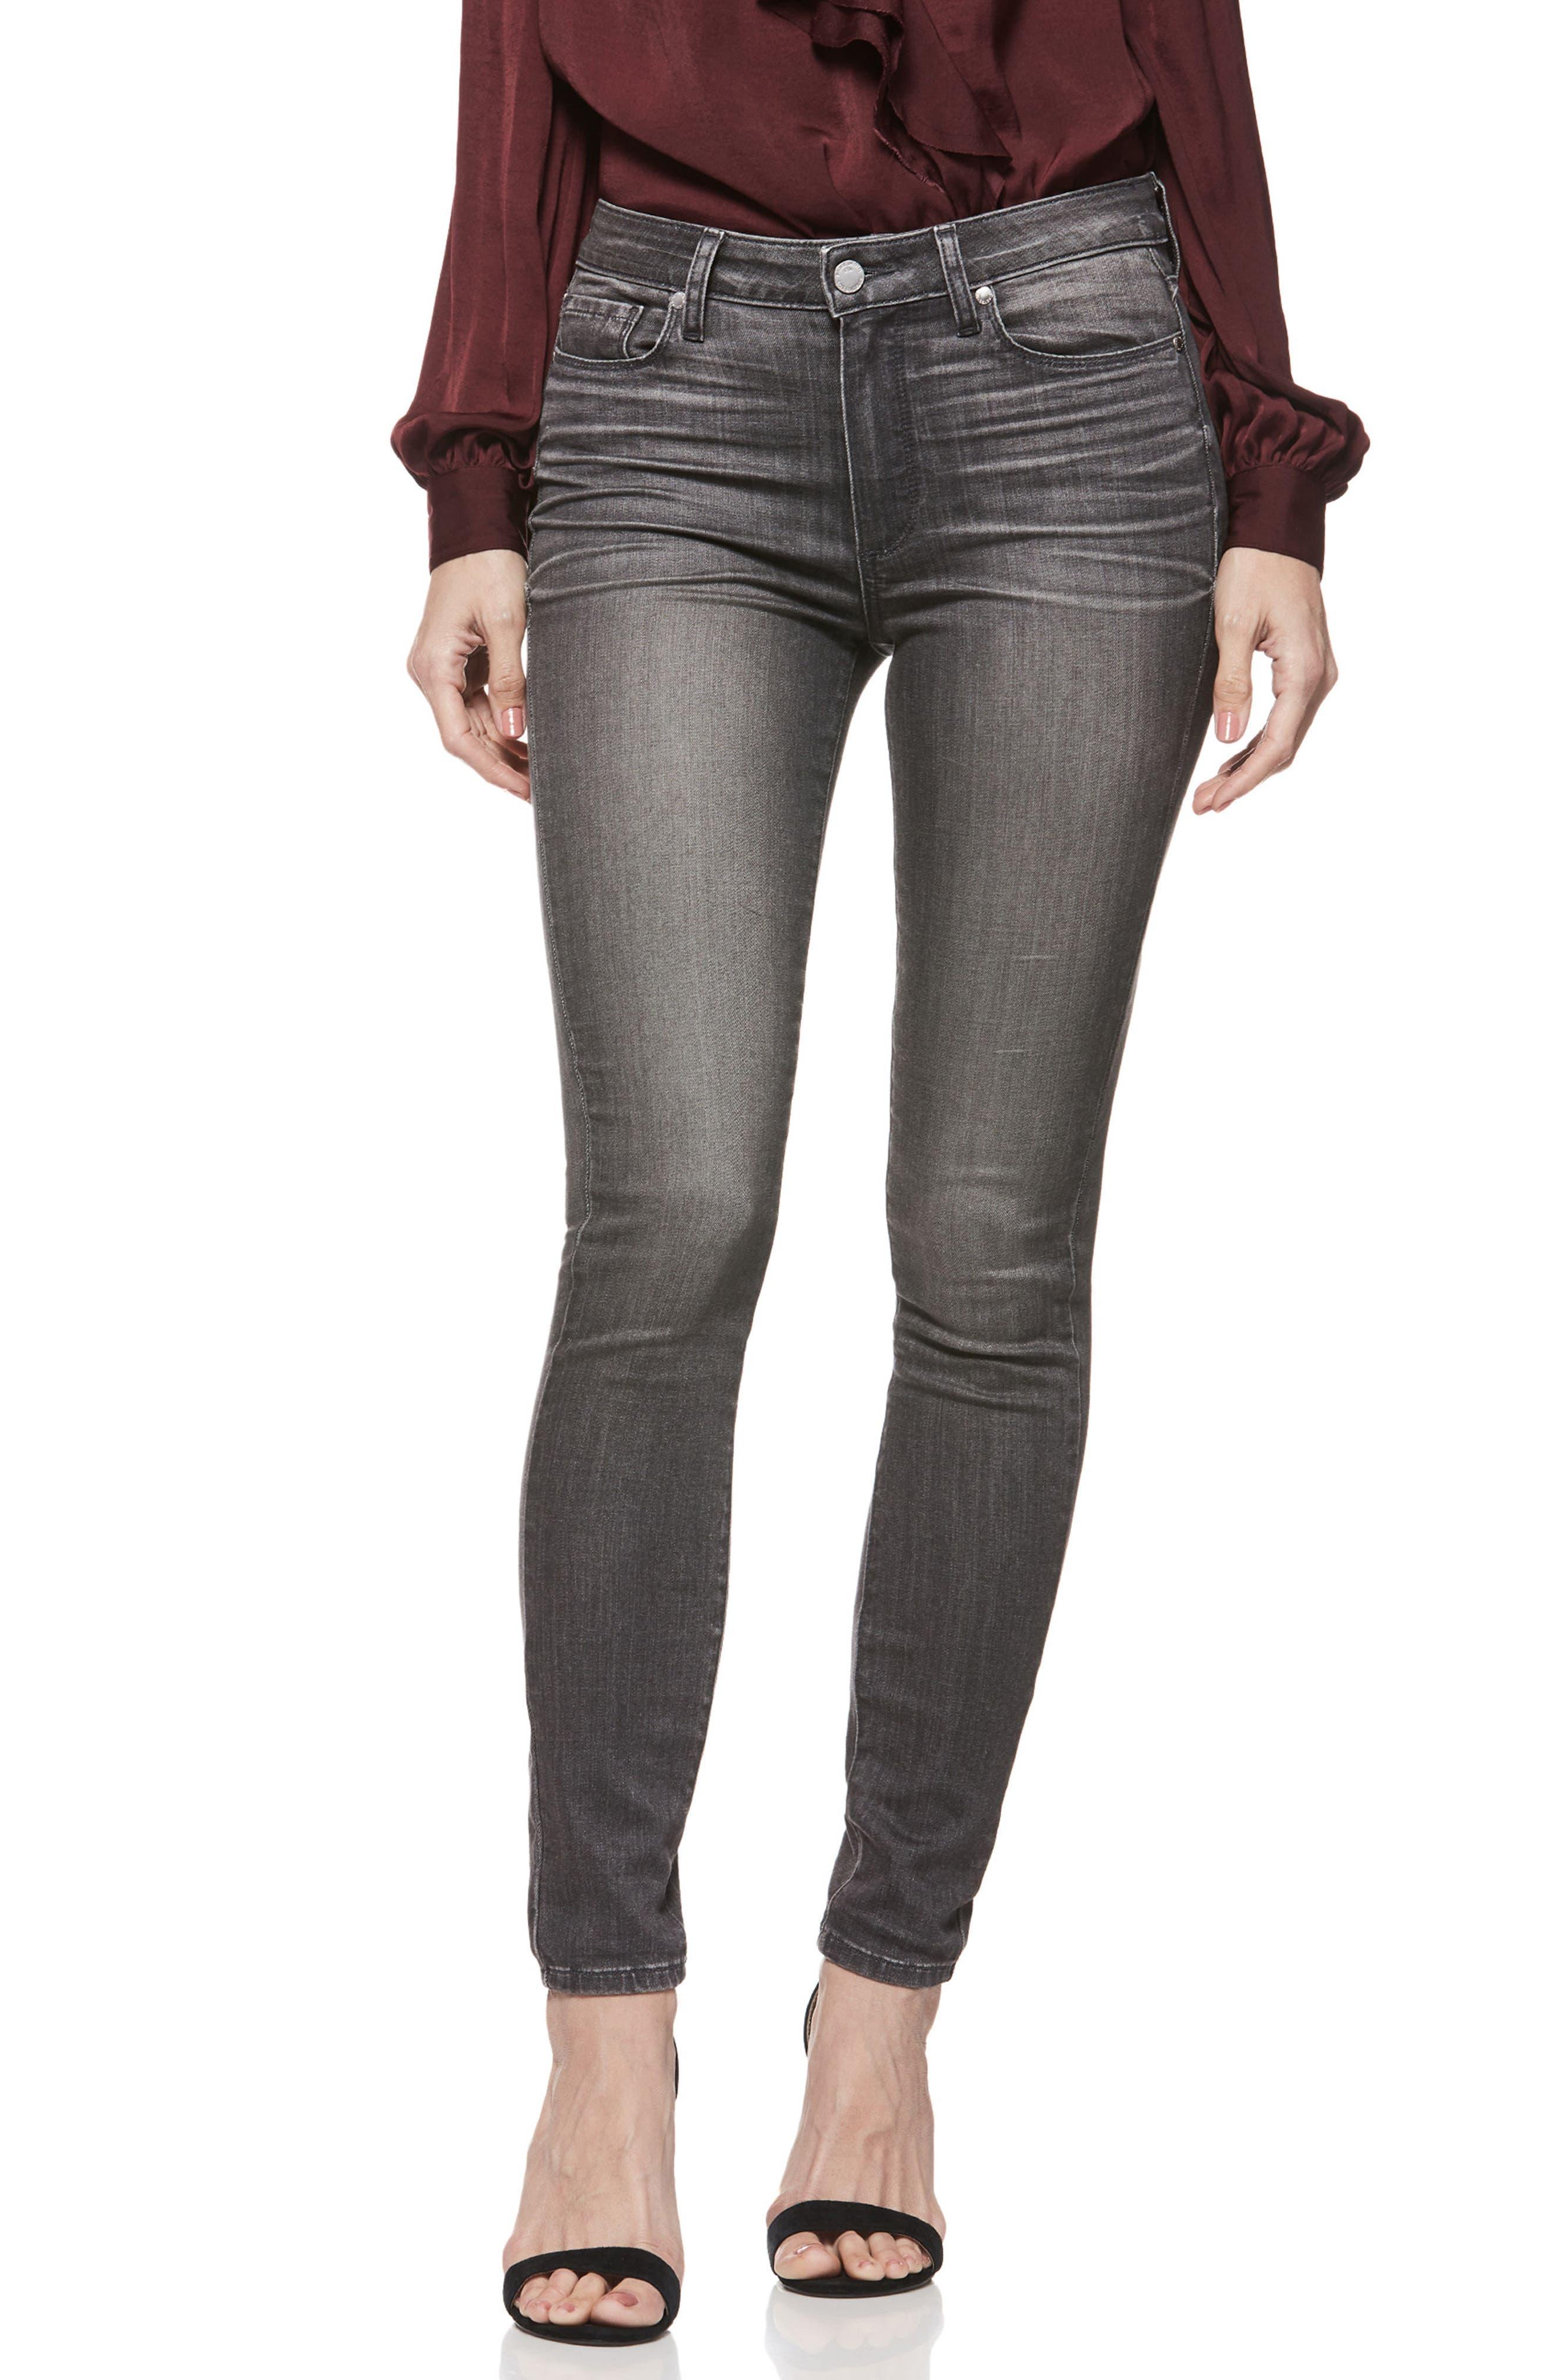 Hoxton Transcend High Waist Skinny Jeans,                             Main thumbnail 1, color,                             GREY PEAKS